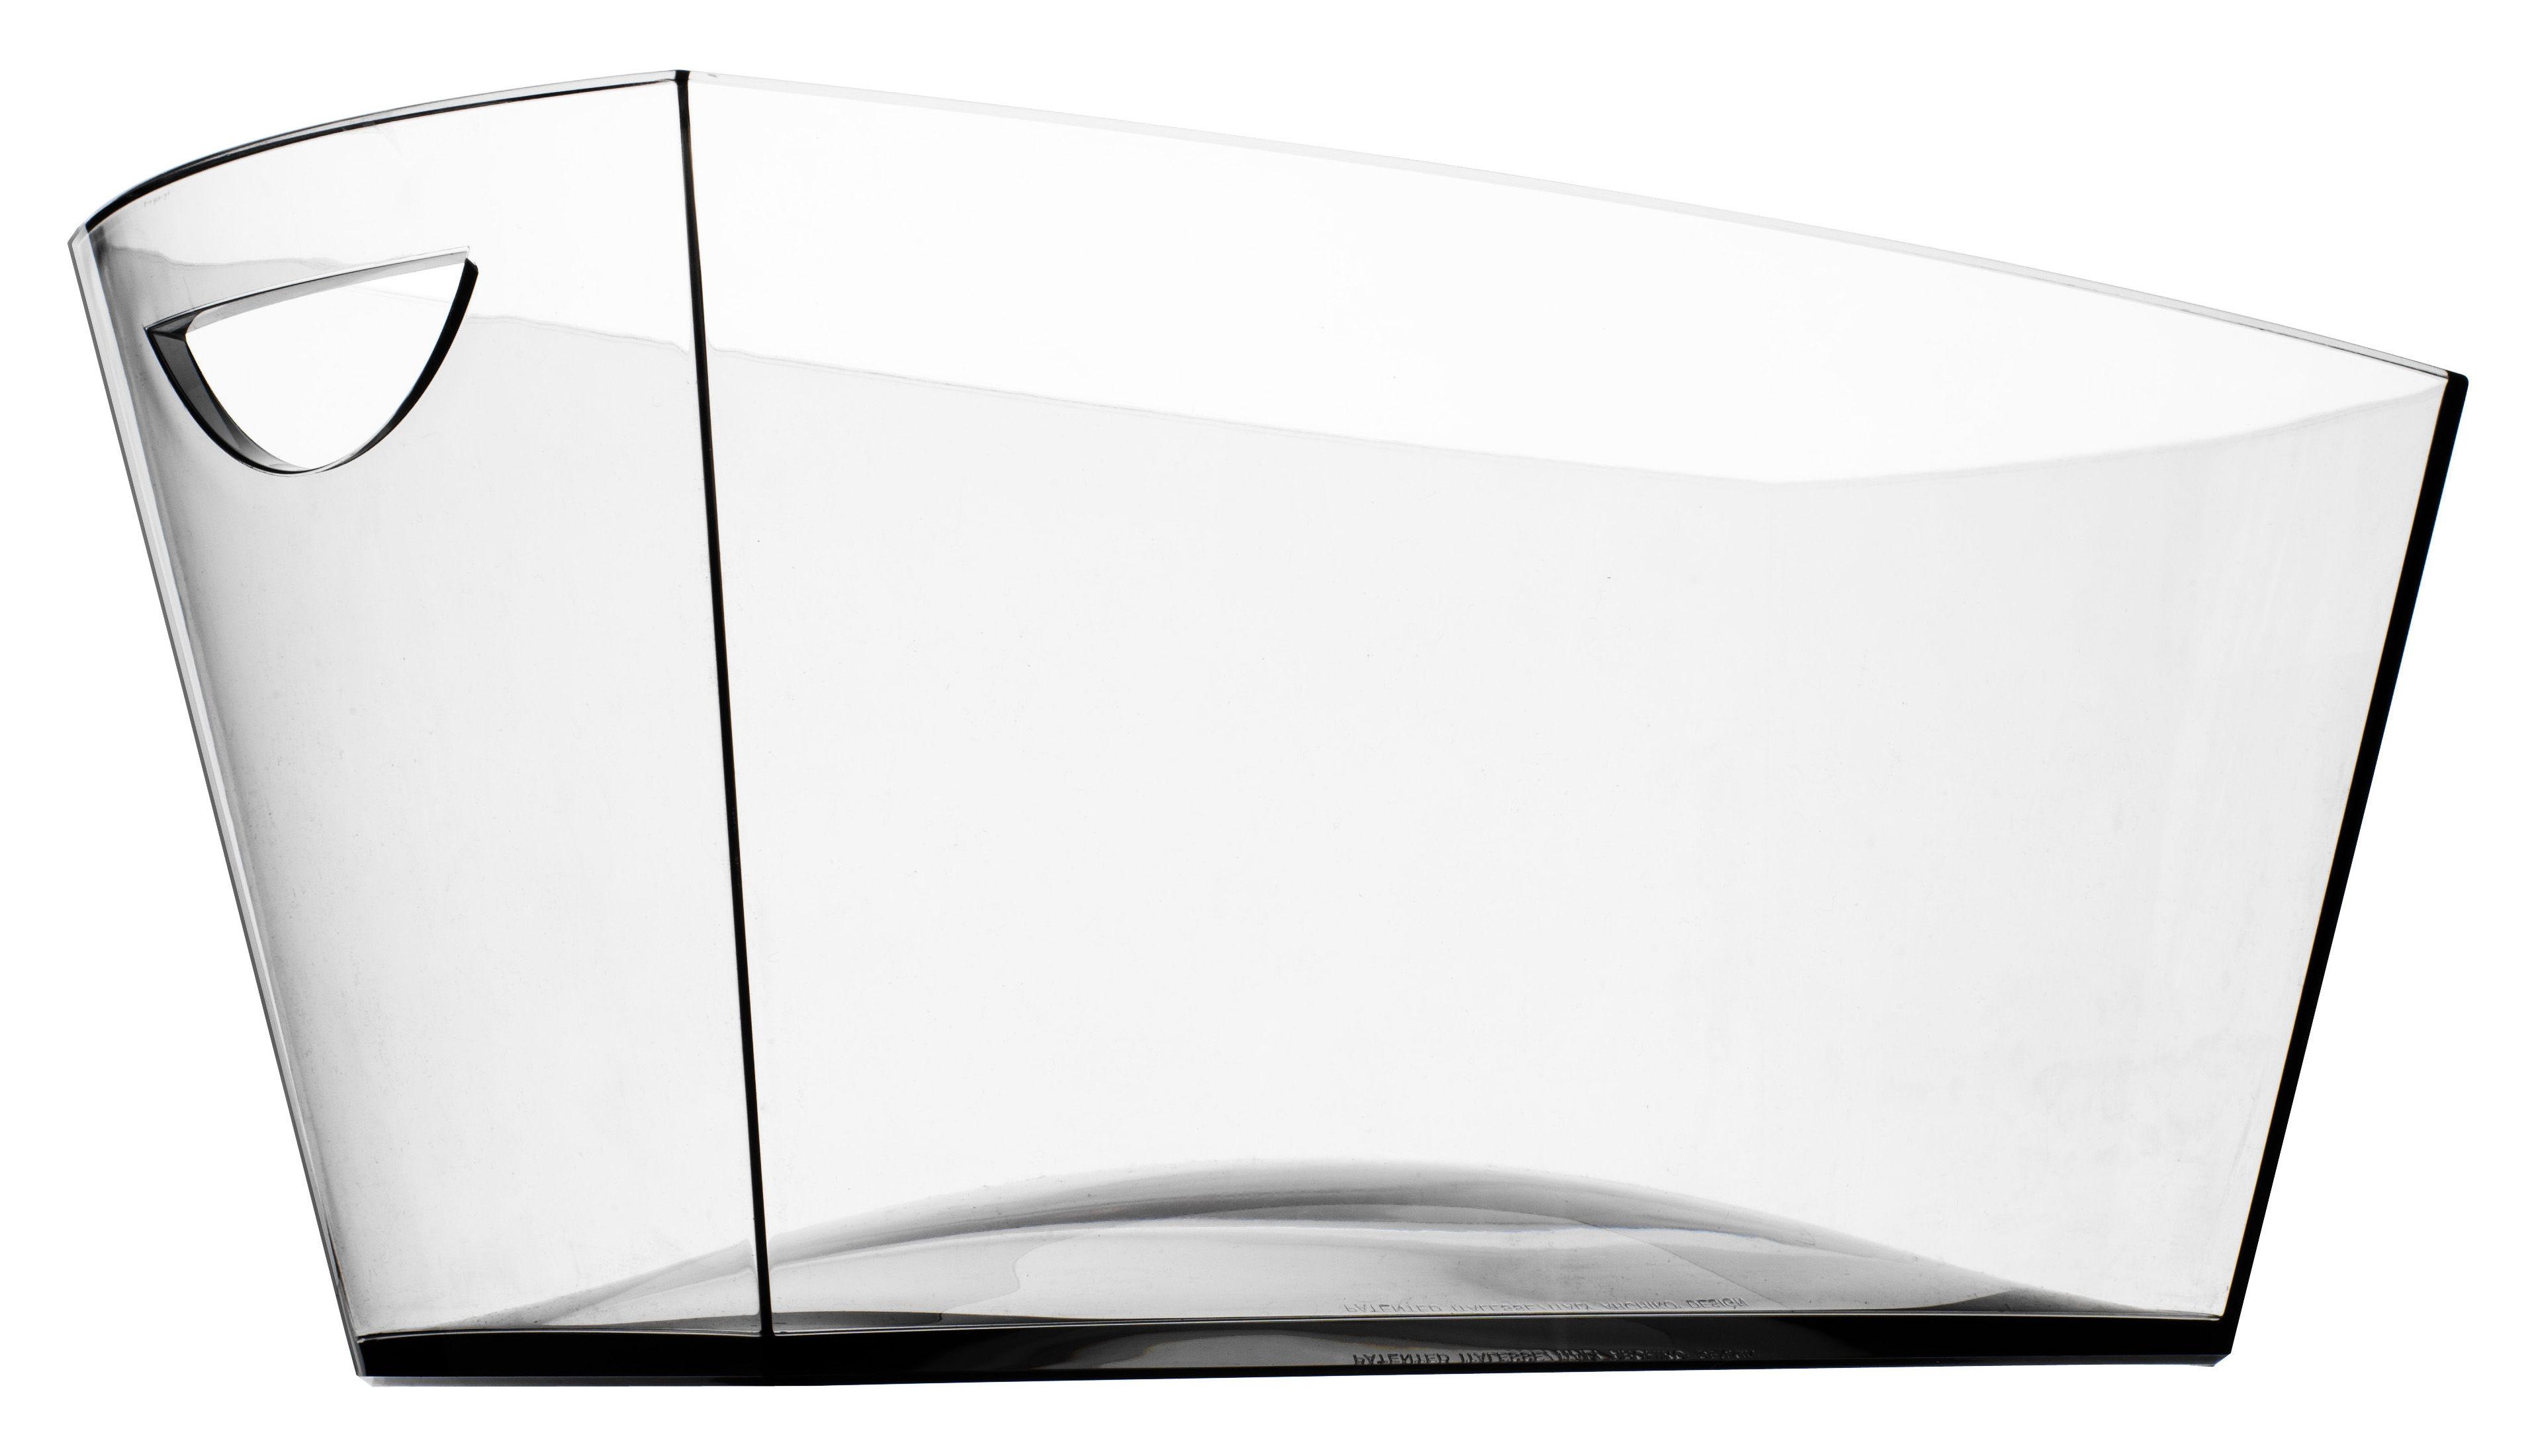 seau champagne gran pagoda 6 bouteilles transparent italesse. Black Bedroom Furniture Sets. Home Design Ideas